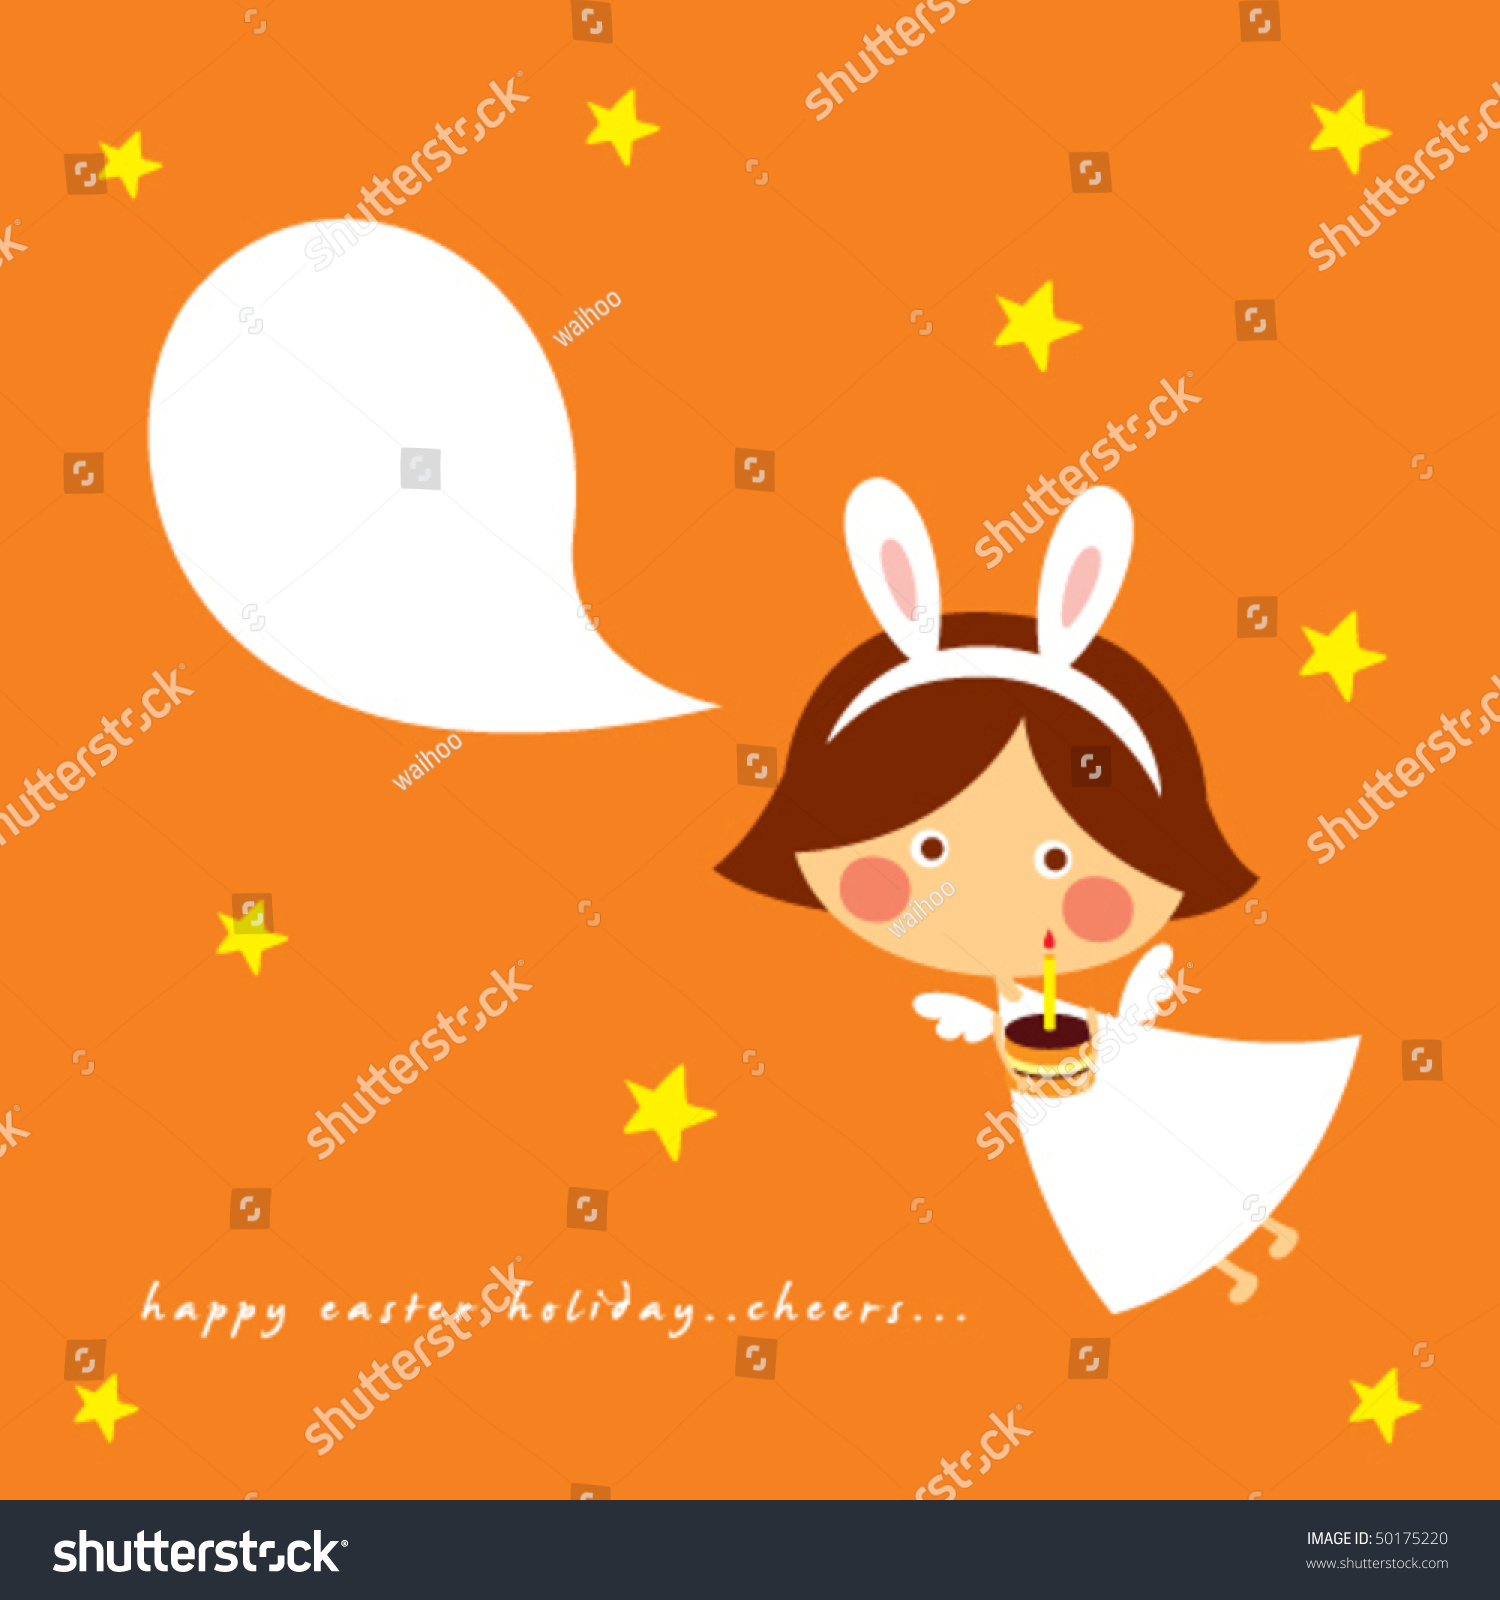 Angel birthday greeting card stock photo photo vector angel birthday greeting card m4hsunfo